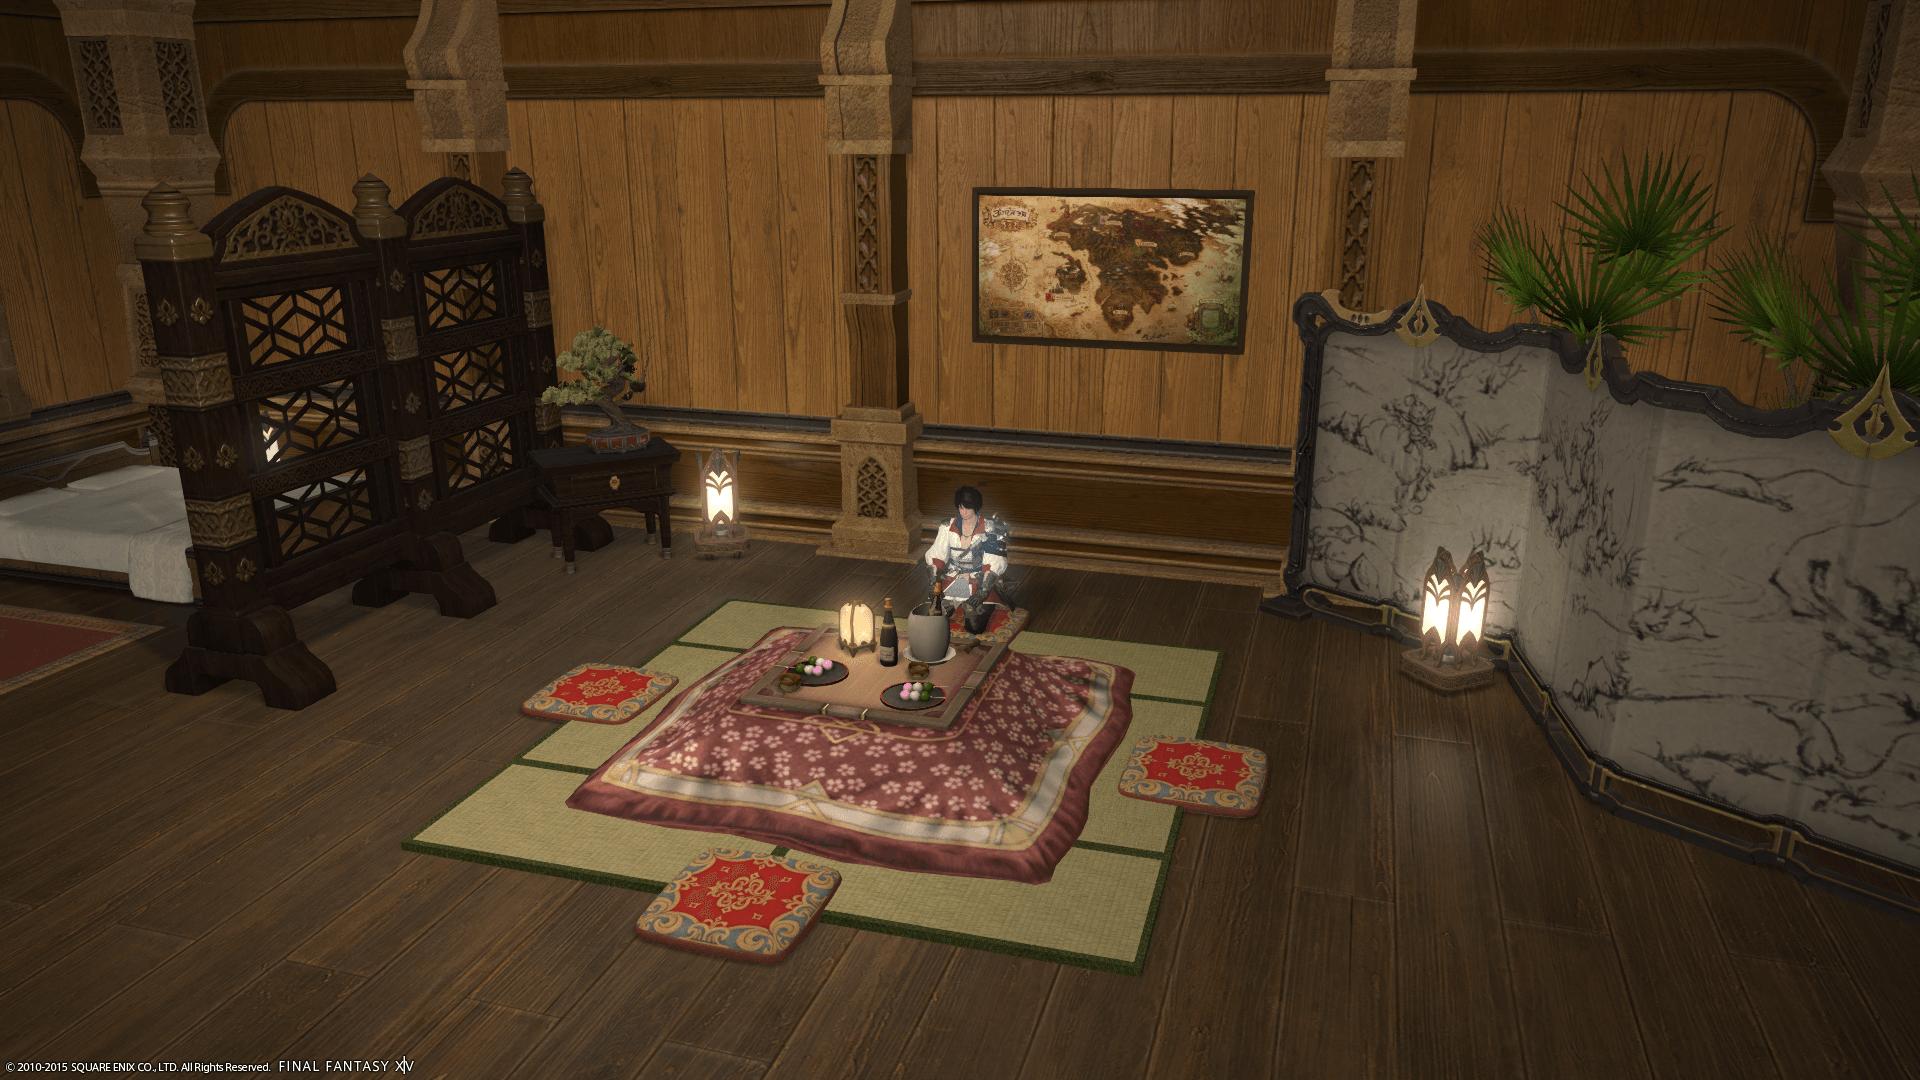 Final FantasyXIV Japanisches Zimmer